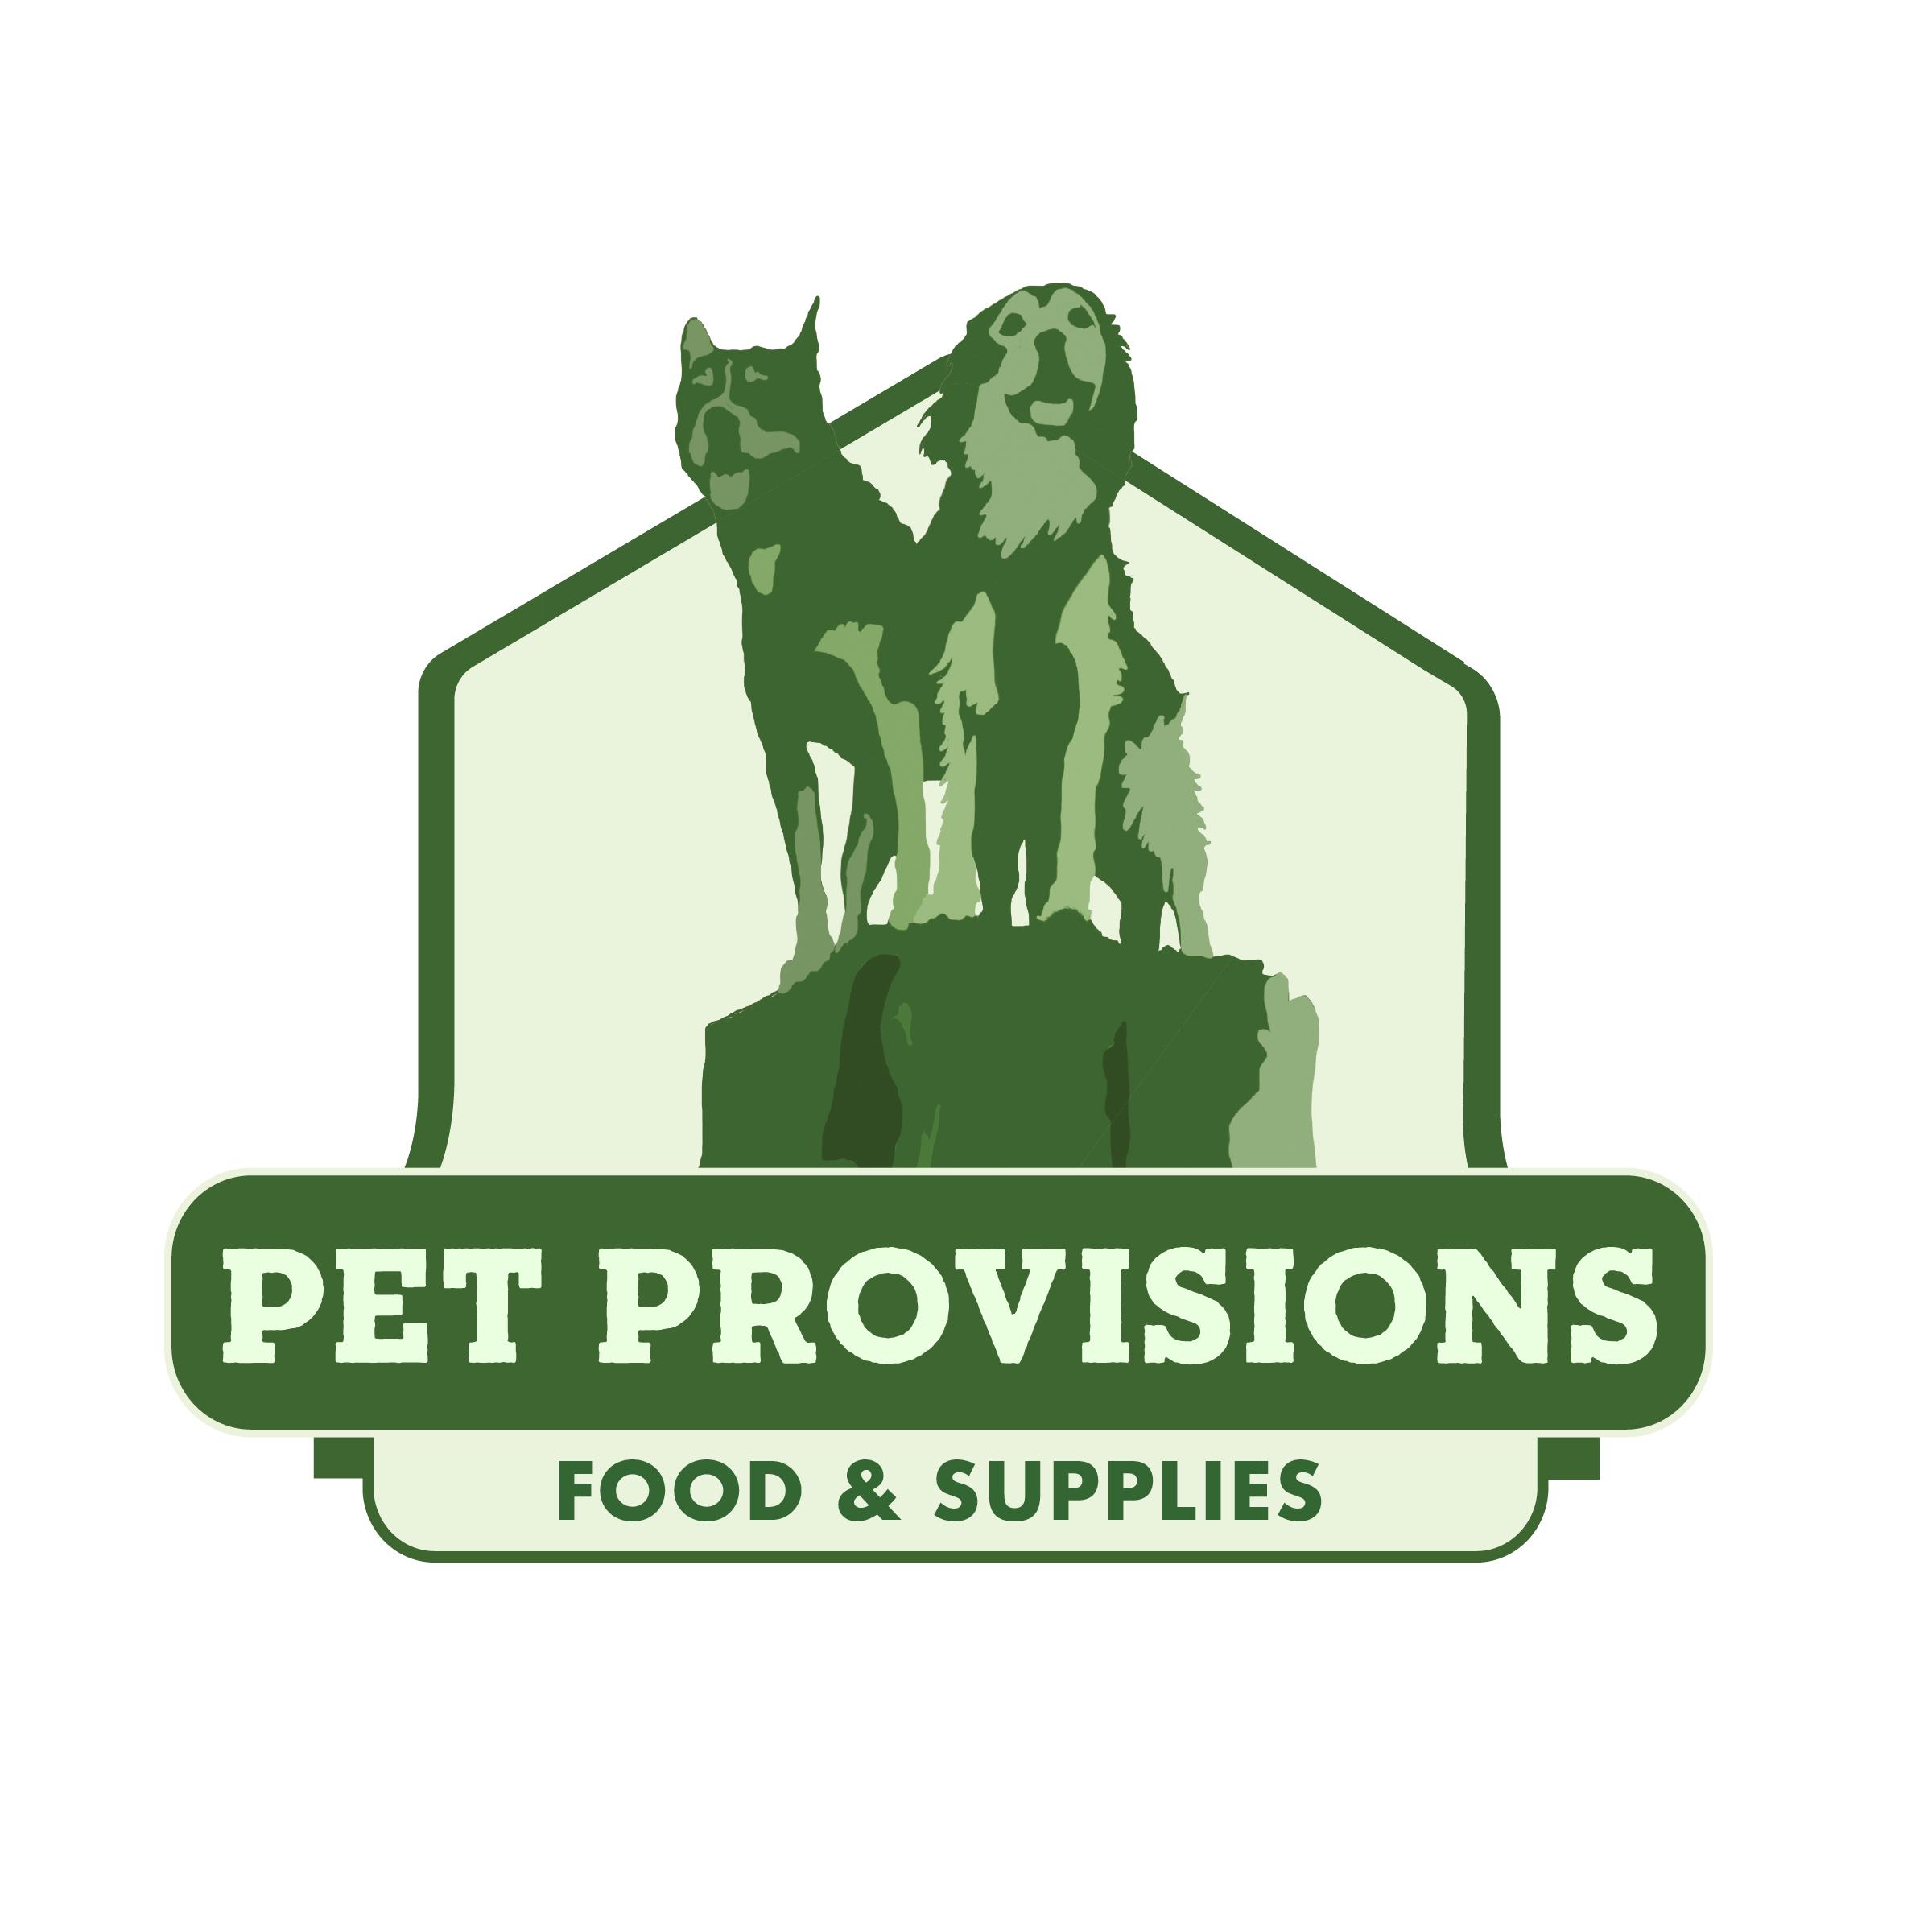 Pet Provisions